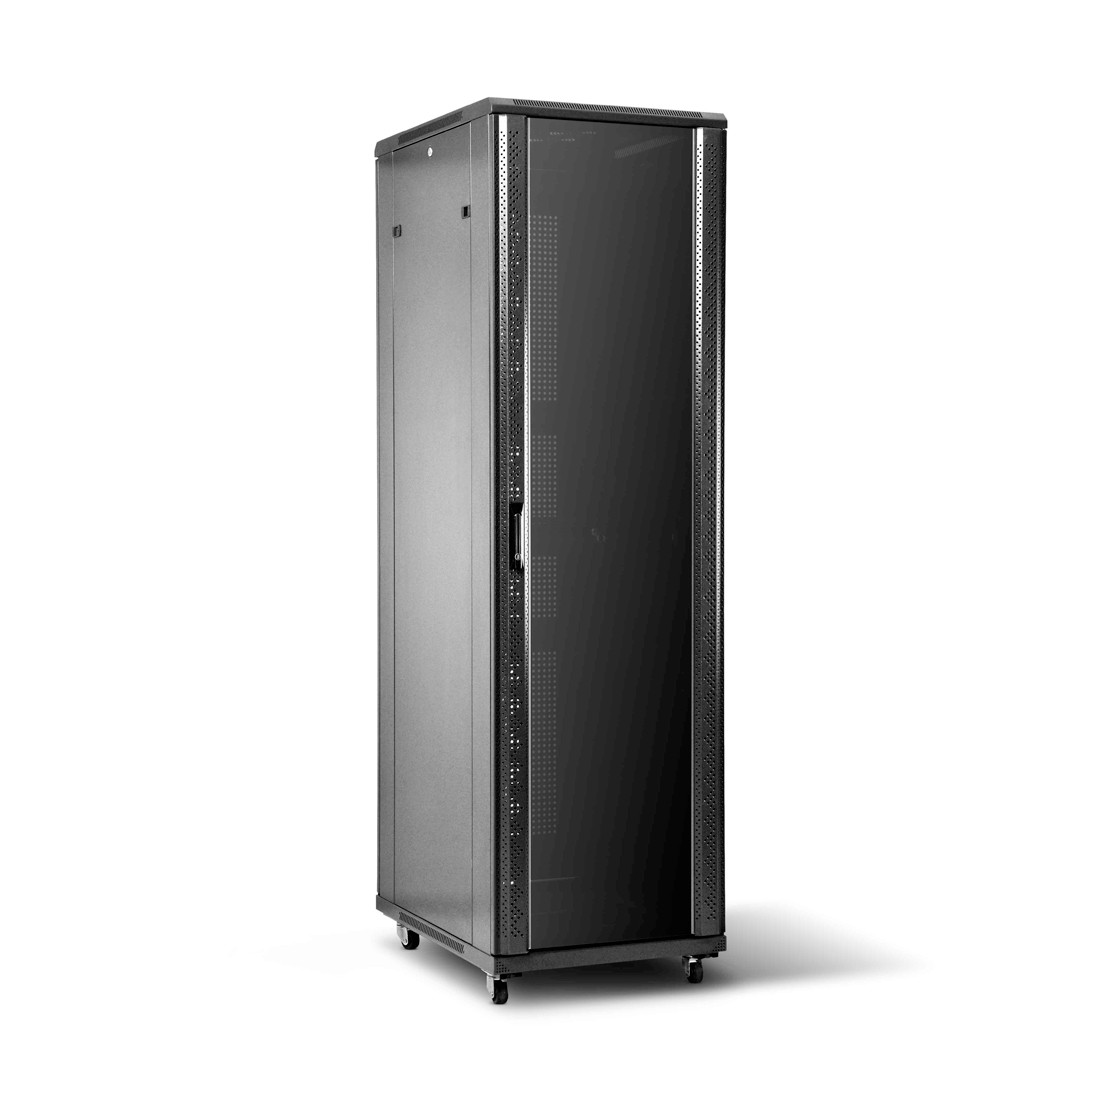 Шкаф серверный SHIP 19'' 47U, 600*1000*2200 мм